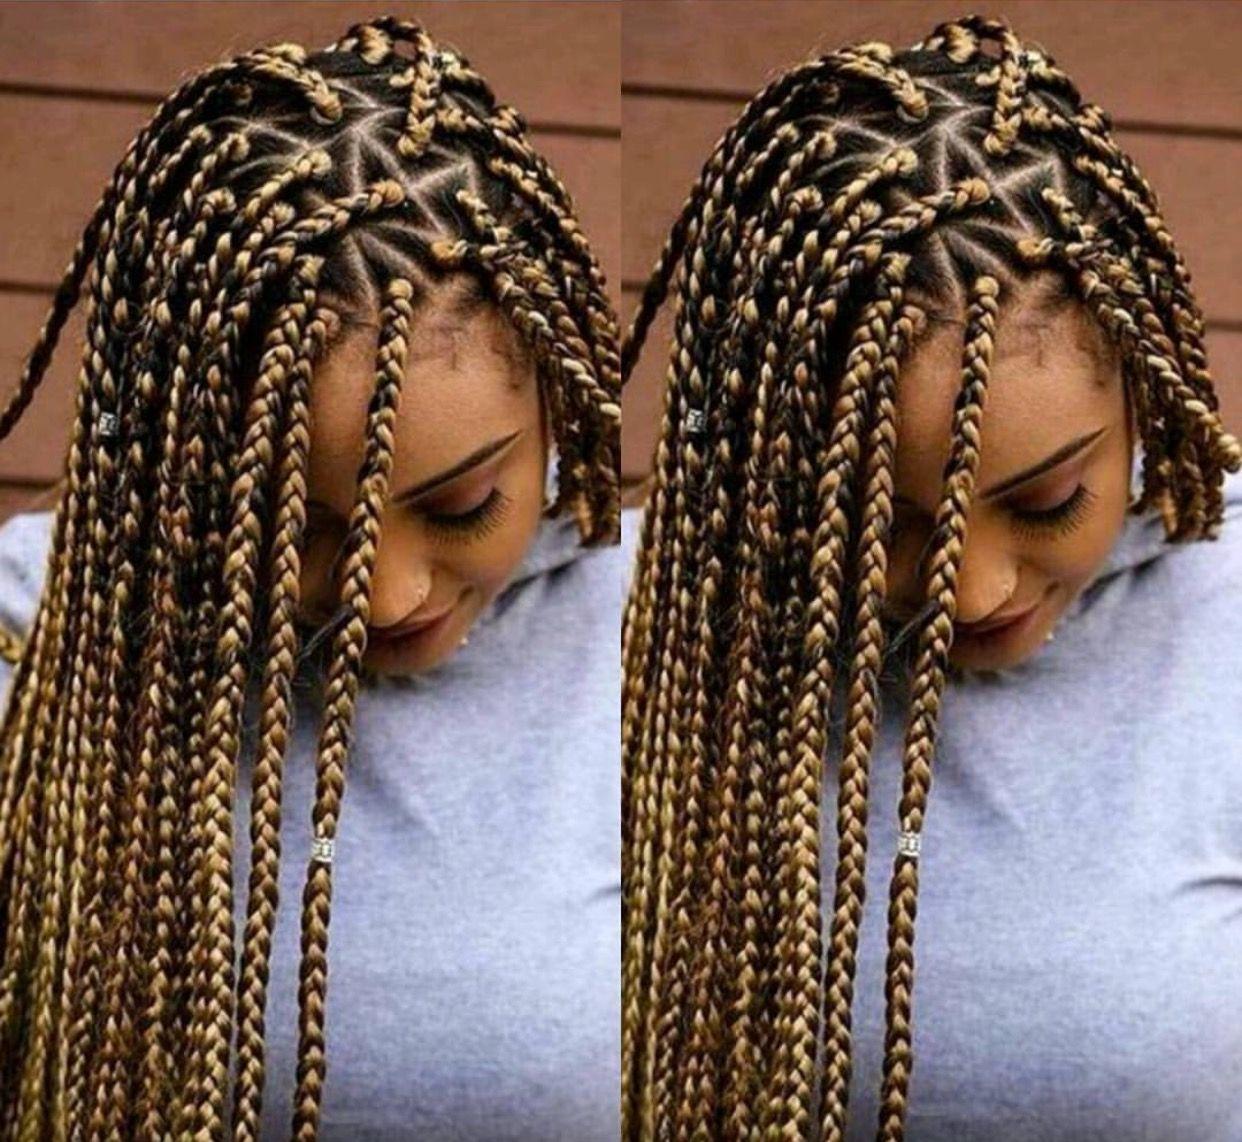 Pin By Chantel Phoenix On Hair Slay Hair Romance Hair Styles Kids Braided Hairstyles